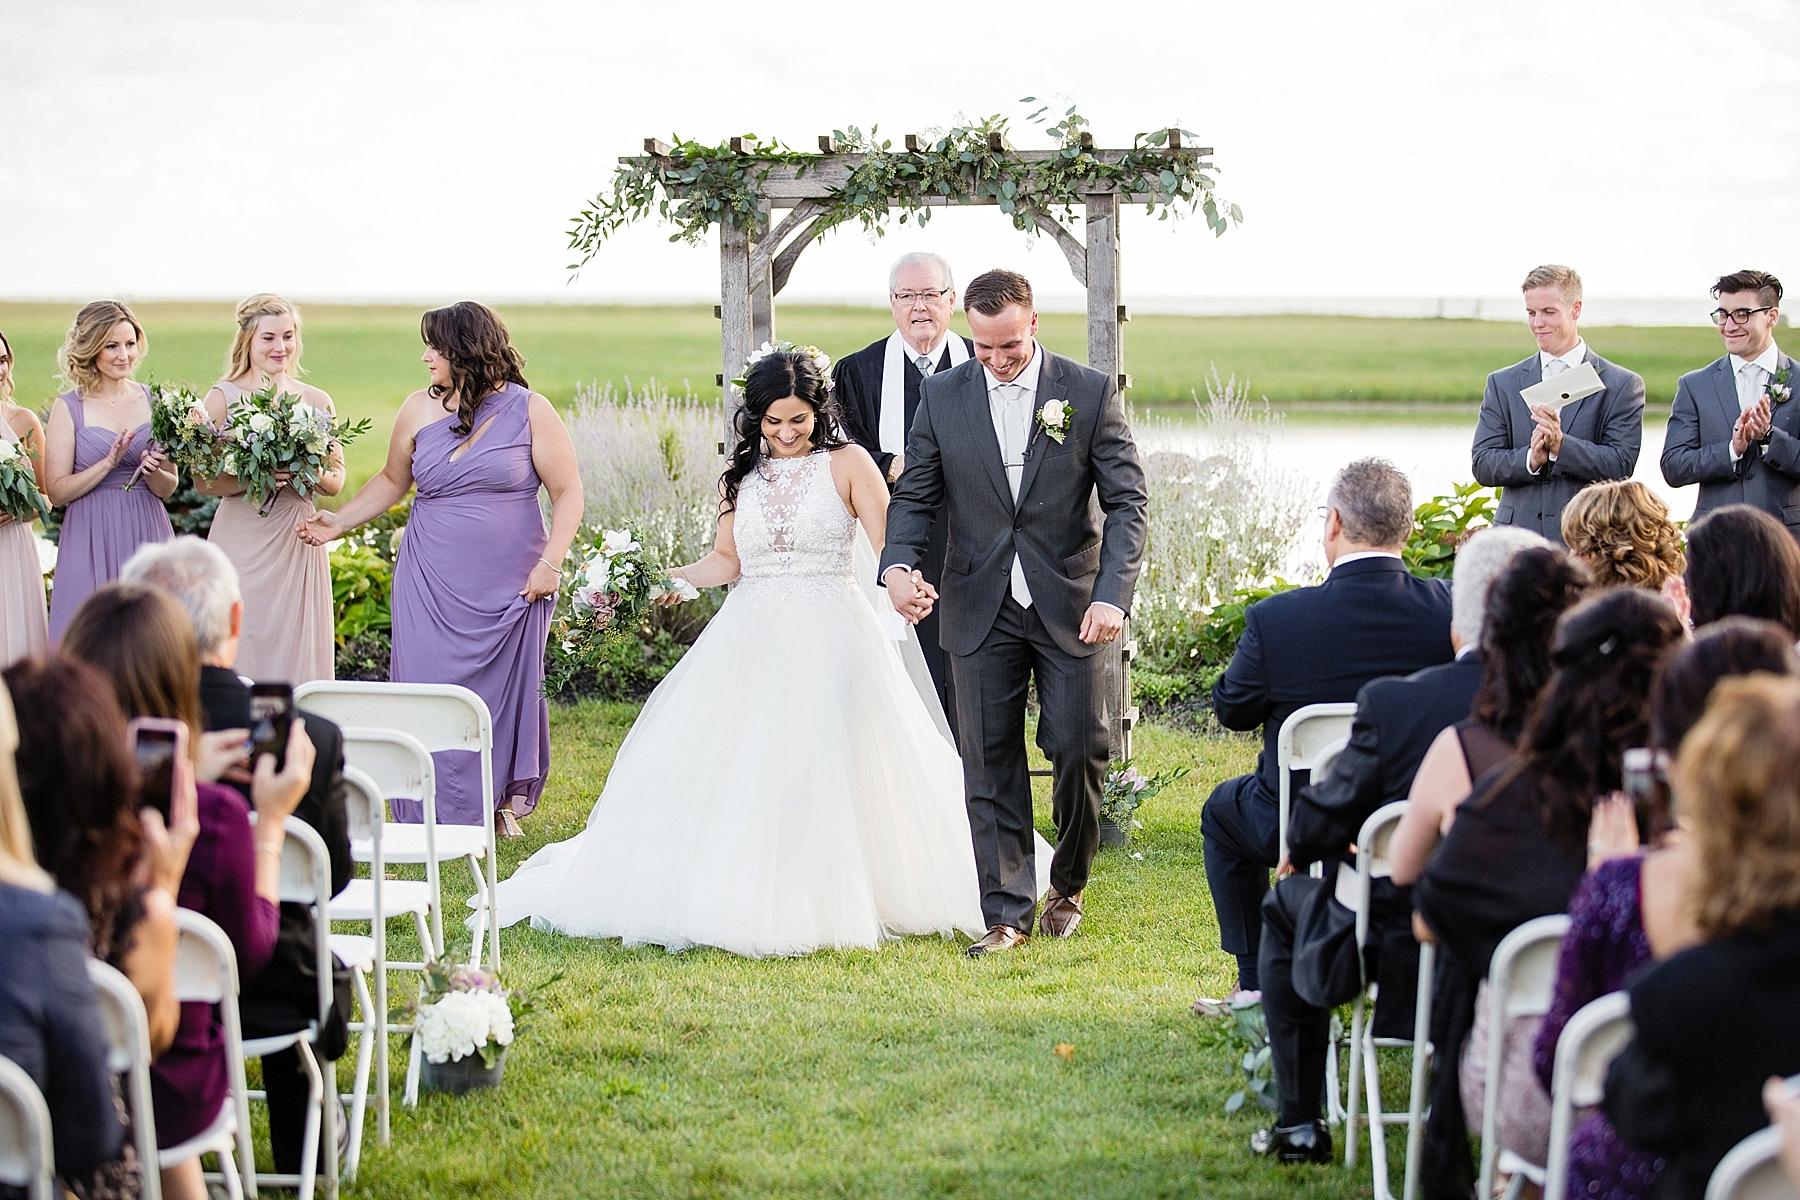 windsor-wedding-photographer-sprucewood-shores-winery-wedding-niagara-on-the-lake-wedding-photographer-eryn-shea-photography_0056.jpg